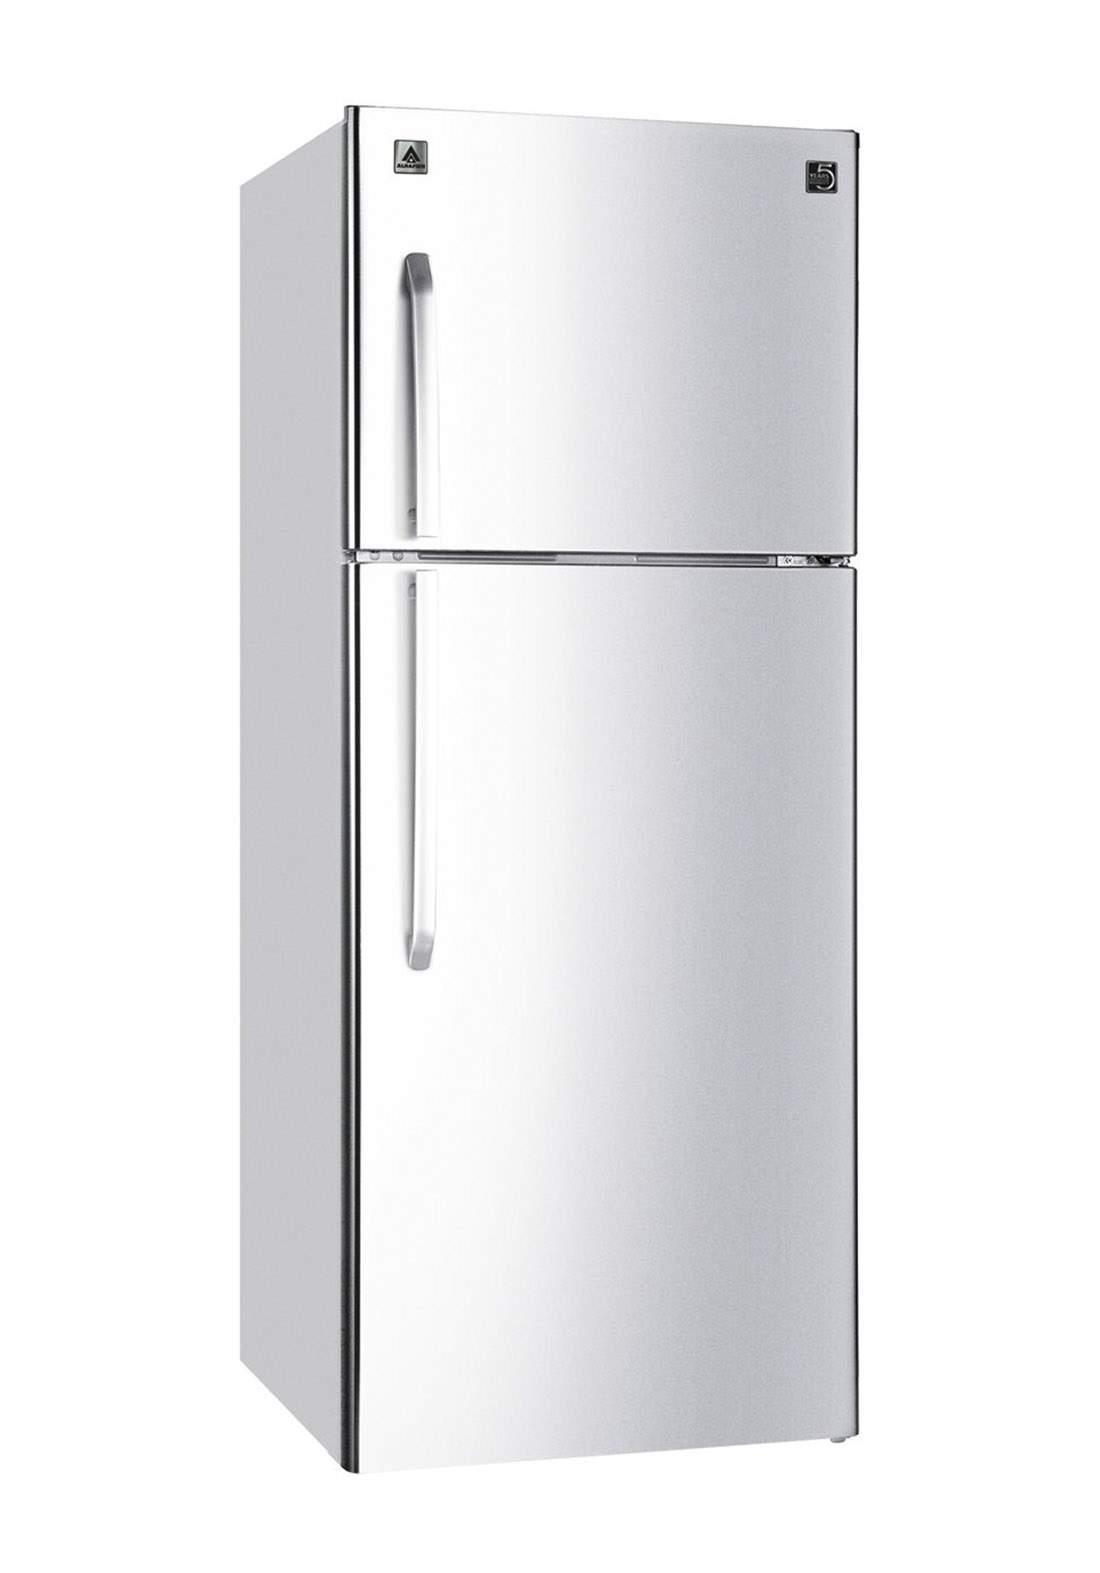 Alhafidh (RFHA-TM600NW1) 21cu.Ft. No Frost  Top Mount Refrigerator ثلاجة بابين